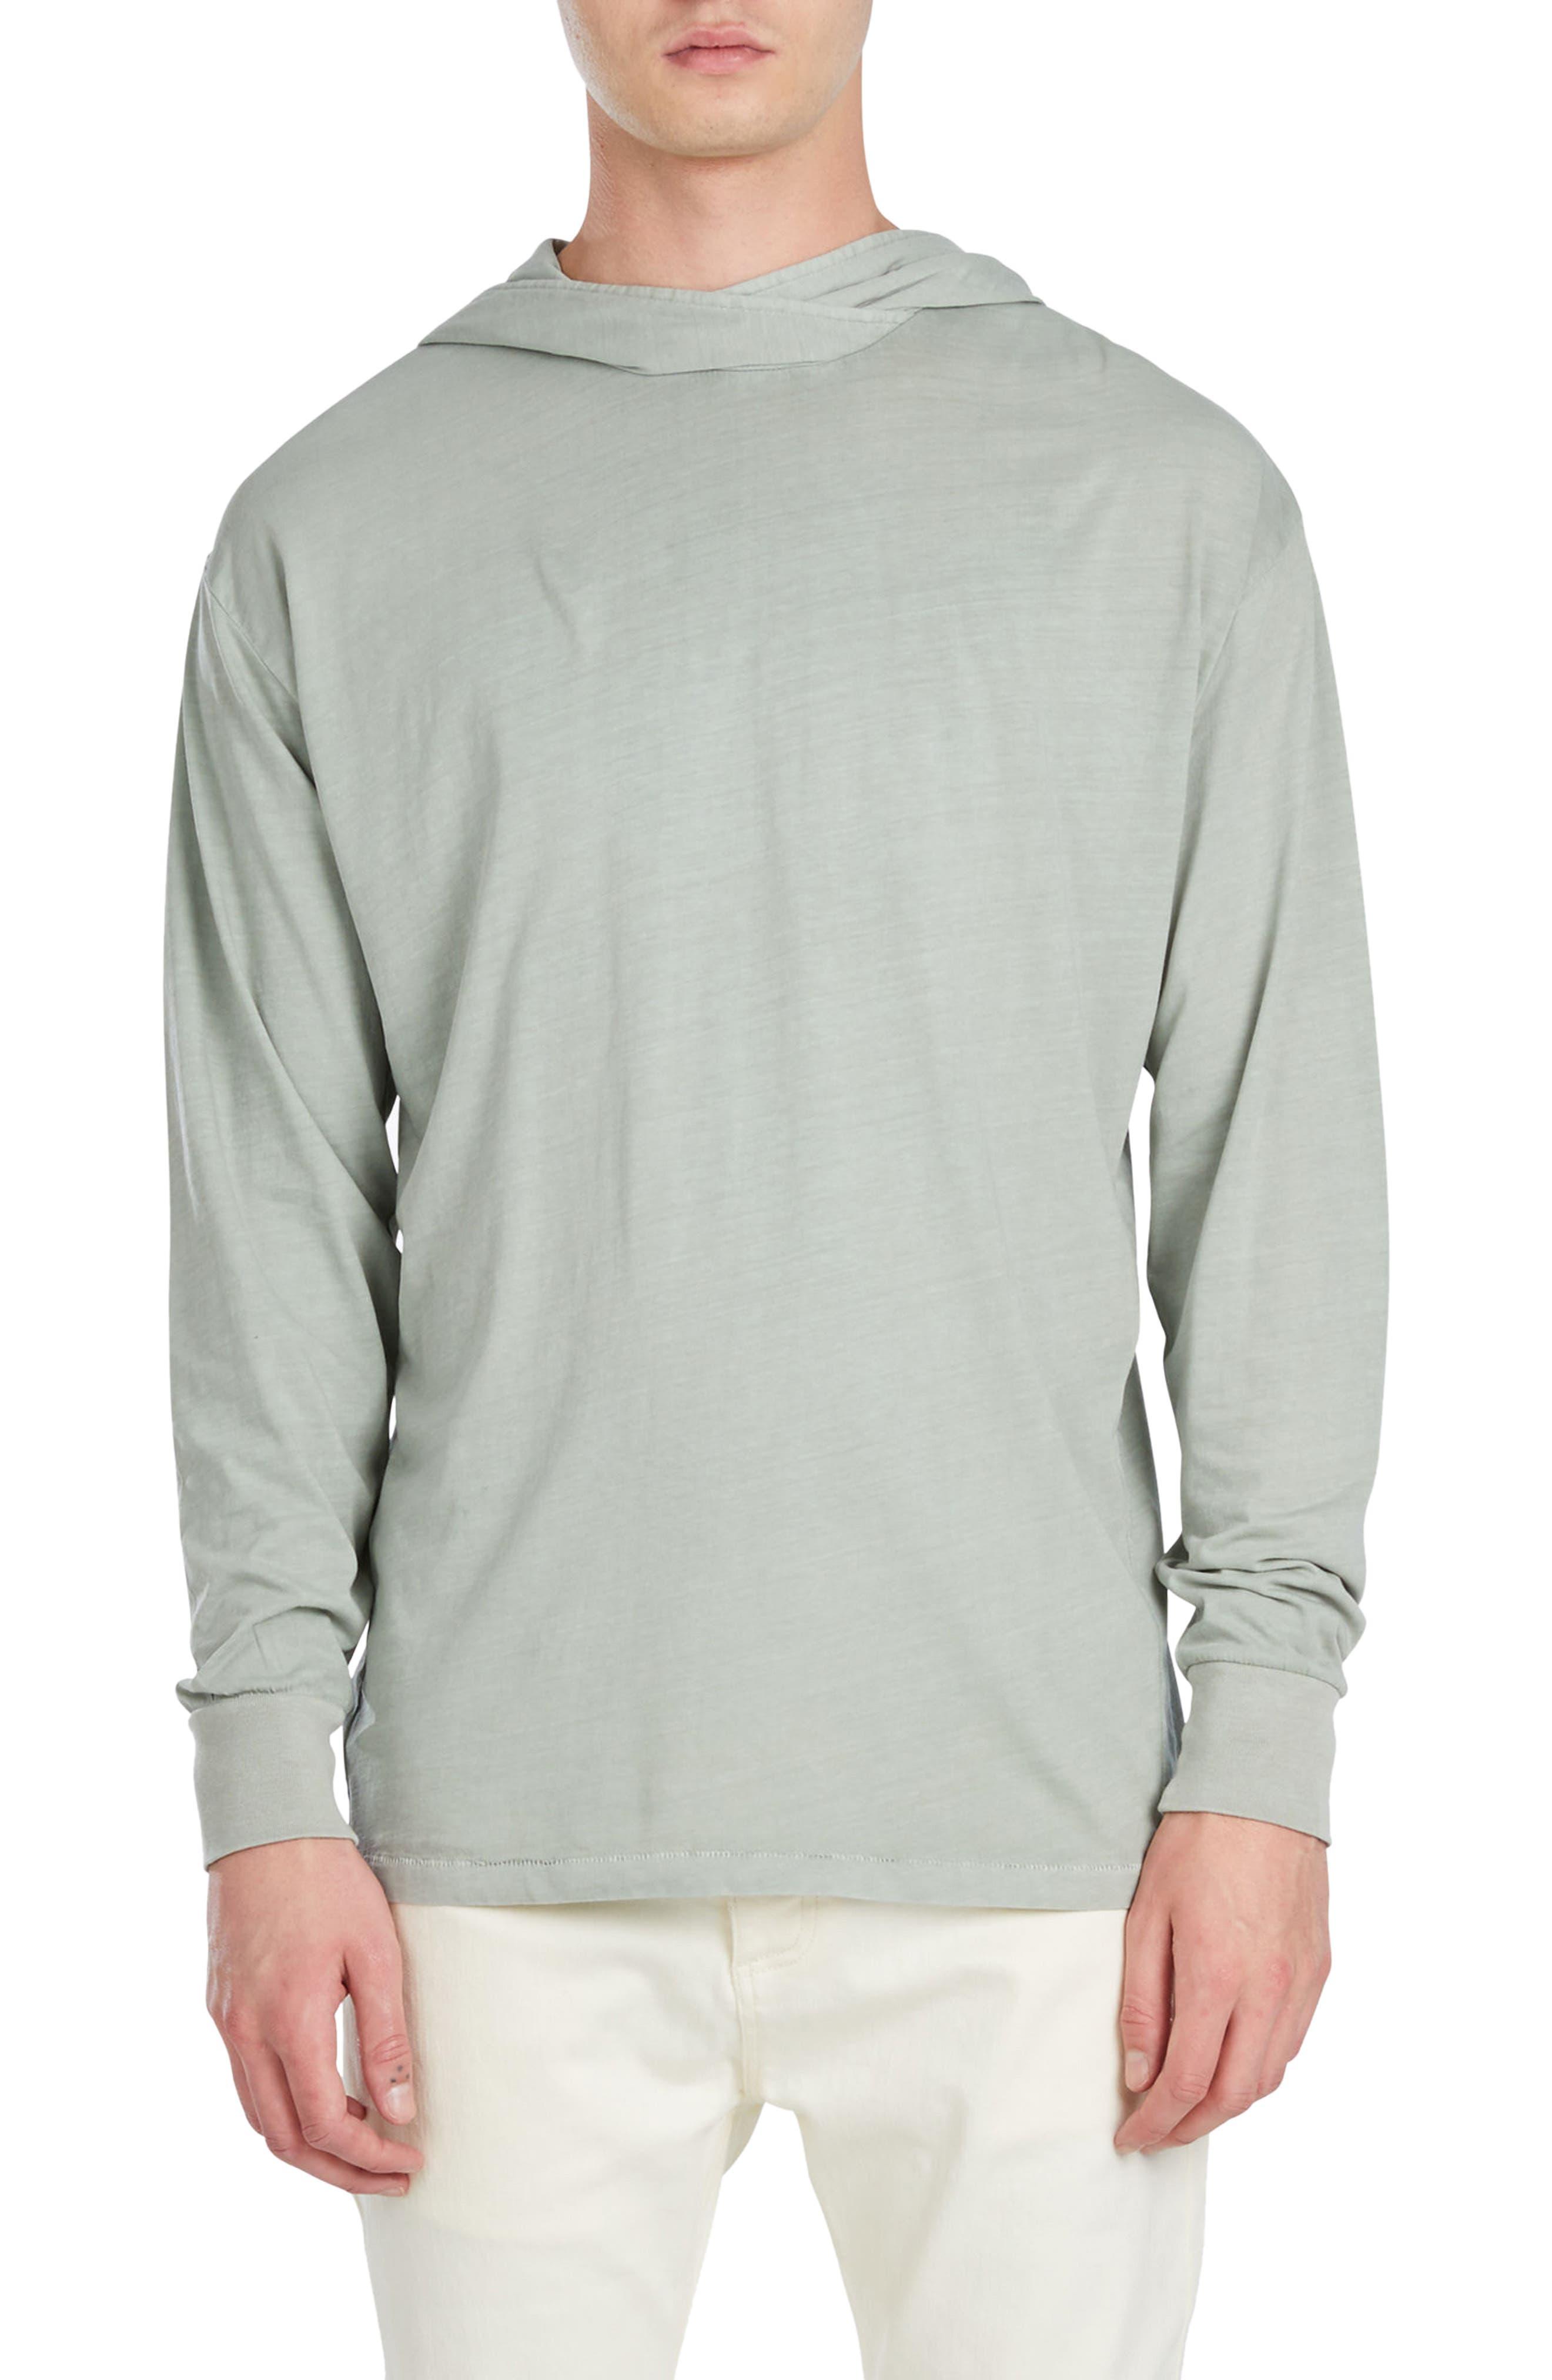 Alternate Image 1 Selected - ZANEROBE Rugger Long Sleeve Hooded T-Shirt